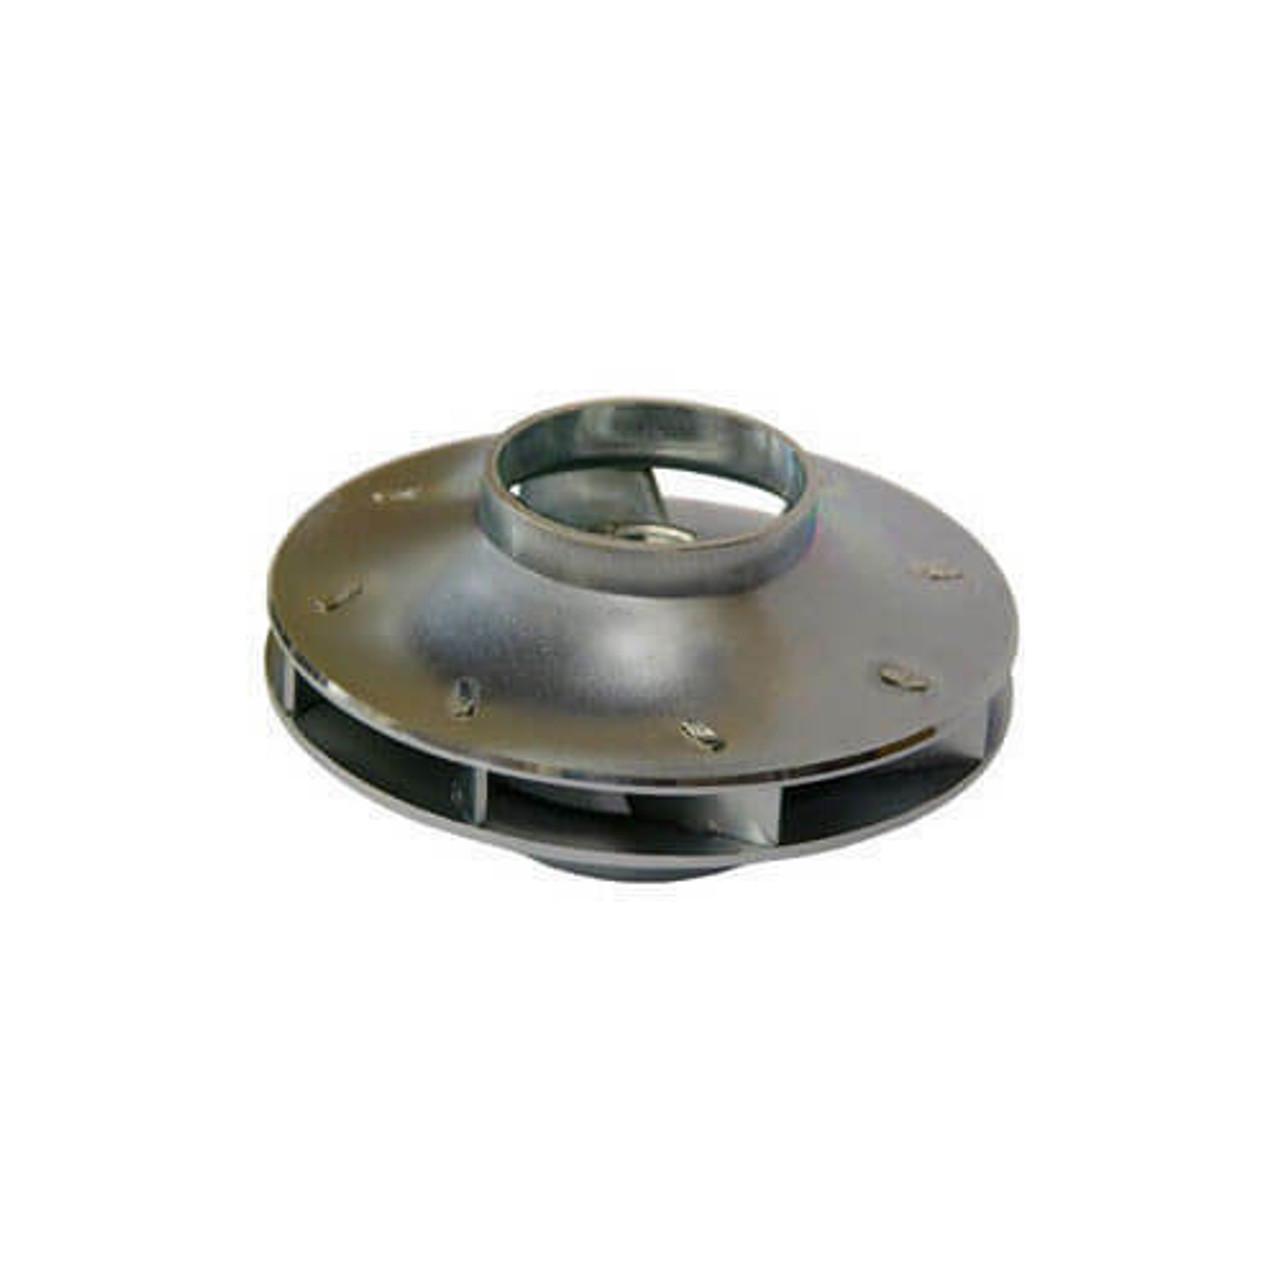 PACO Pump Replacement Parts / Kits 97642561, Impeller Kit, Nickel Aluminum Bronze with 9.54 Impeller Trim